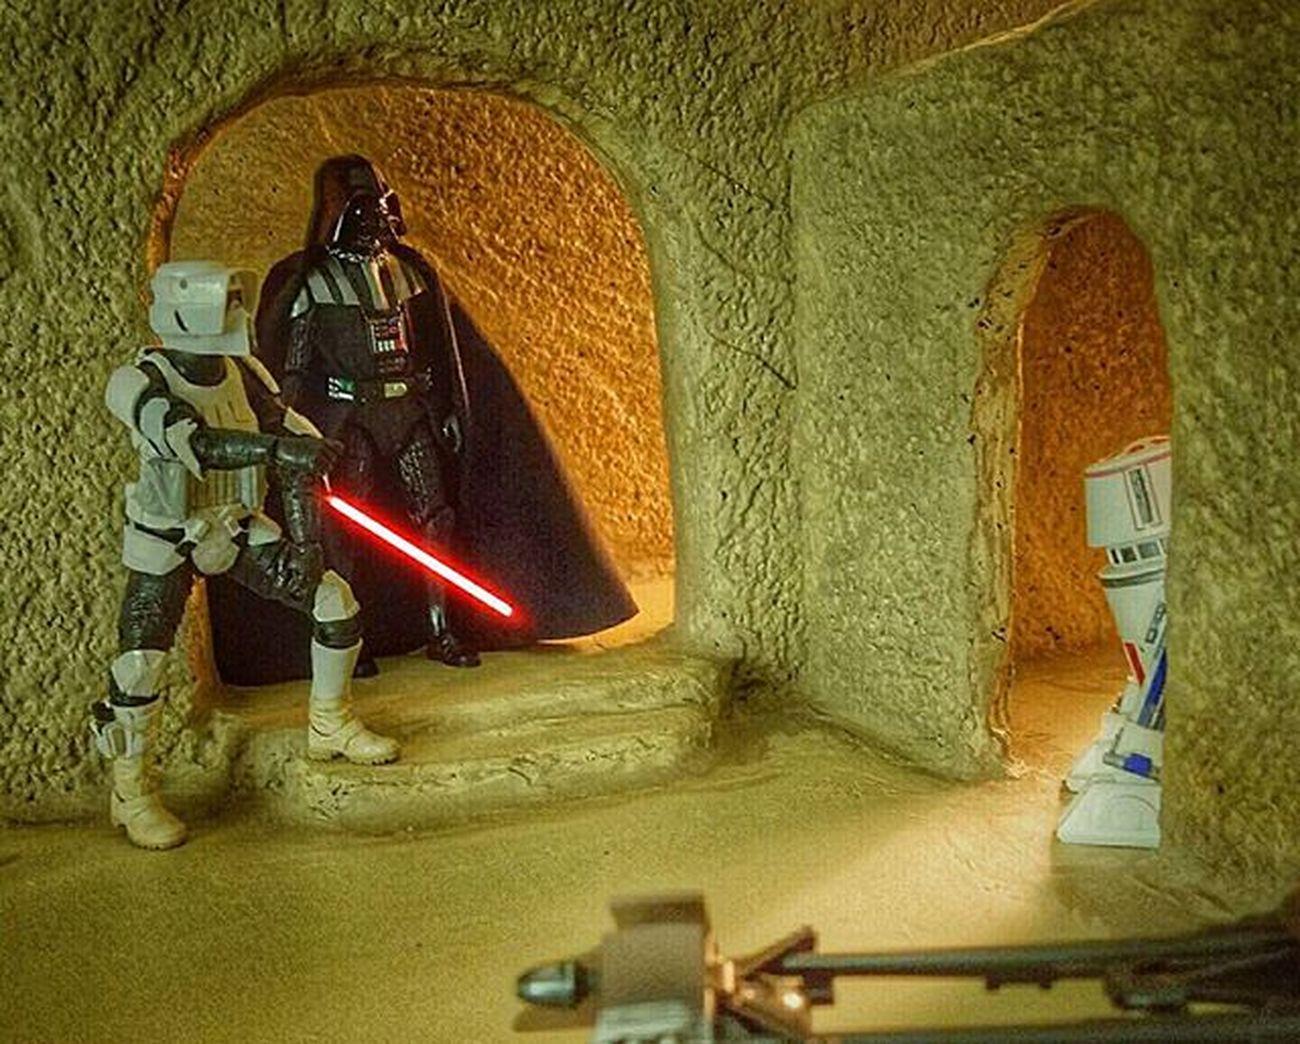 There he goes Lord Vader! R4 Droids Starwars Blackseries Scouttrooper Speederbike Starwars Tatooine Toyphotography Figures Sandtooine Diorama Lightsaber Ihatesand Starwarsblackseries